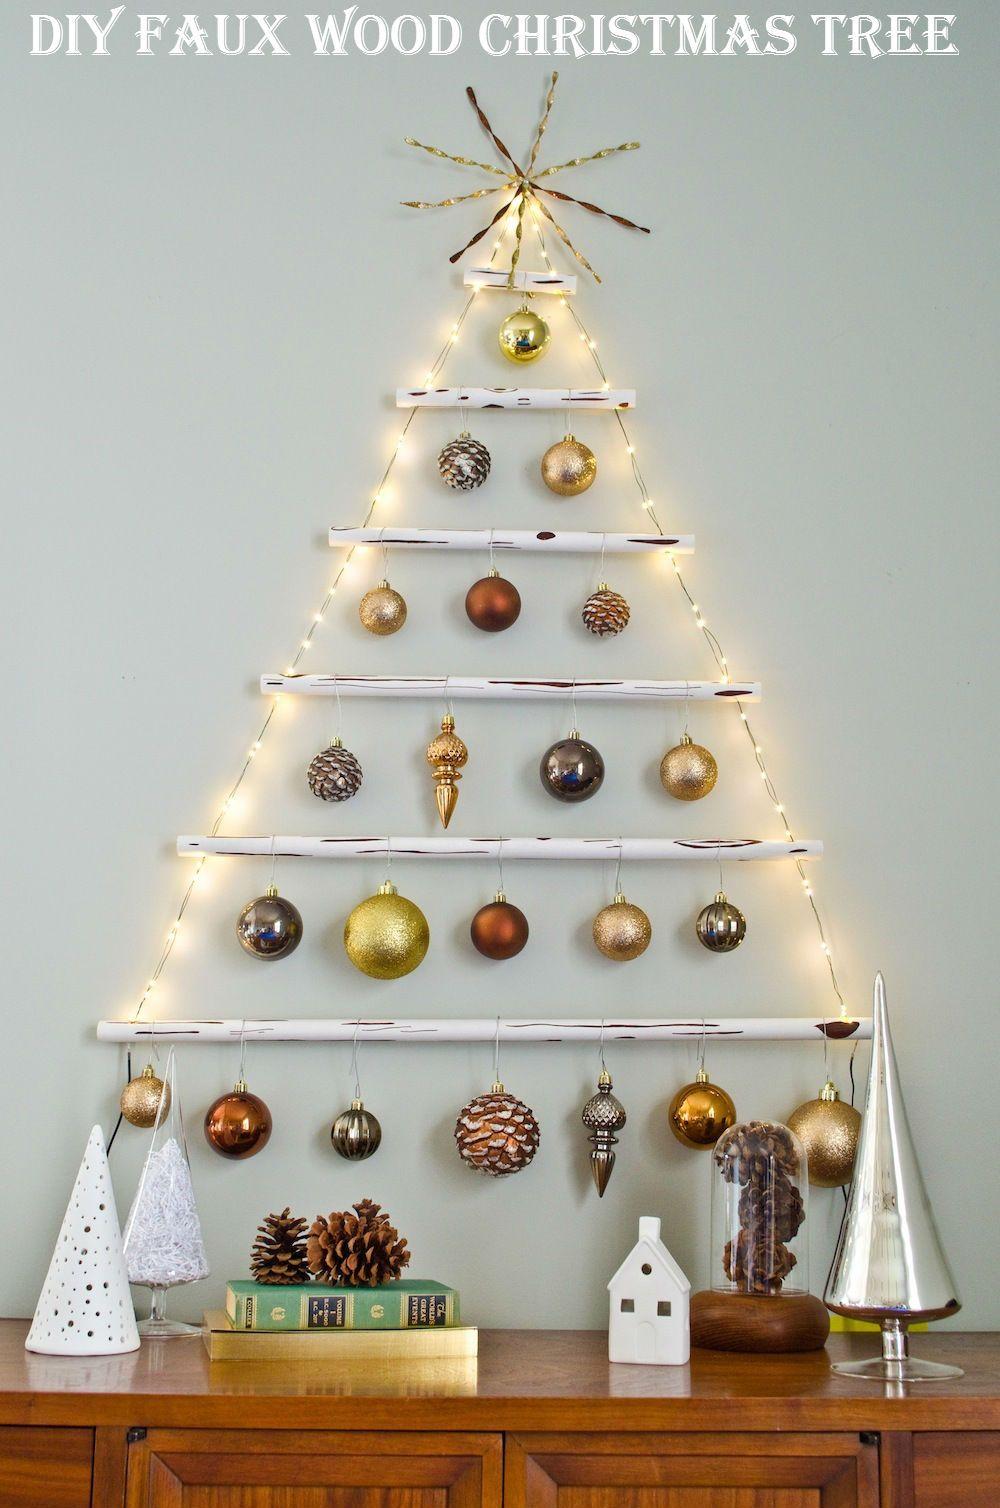 Diy Faux Wood Christmas Tree Diy Ideas By You Hanging Christmas Tree Wall Christmas Tree Alternative Christmas Tree